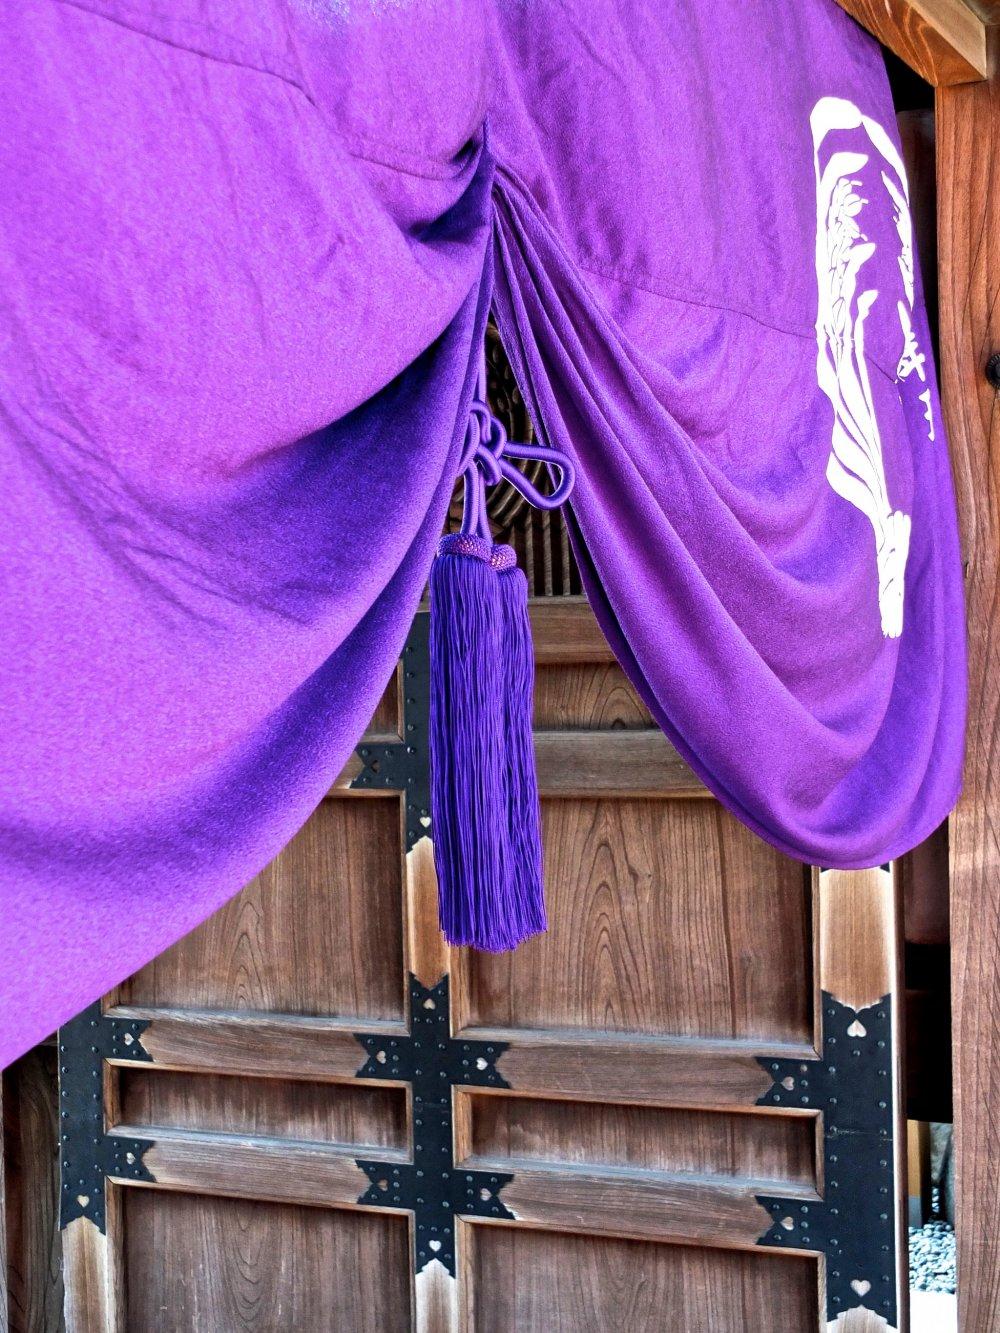 Beautiful entrance toToyokawa Inari Temple, Akasaka